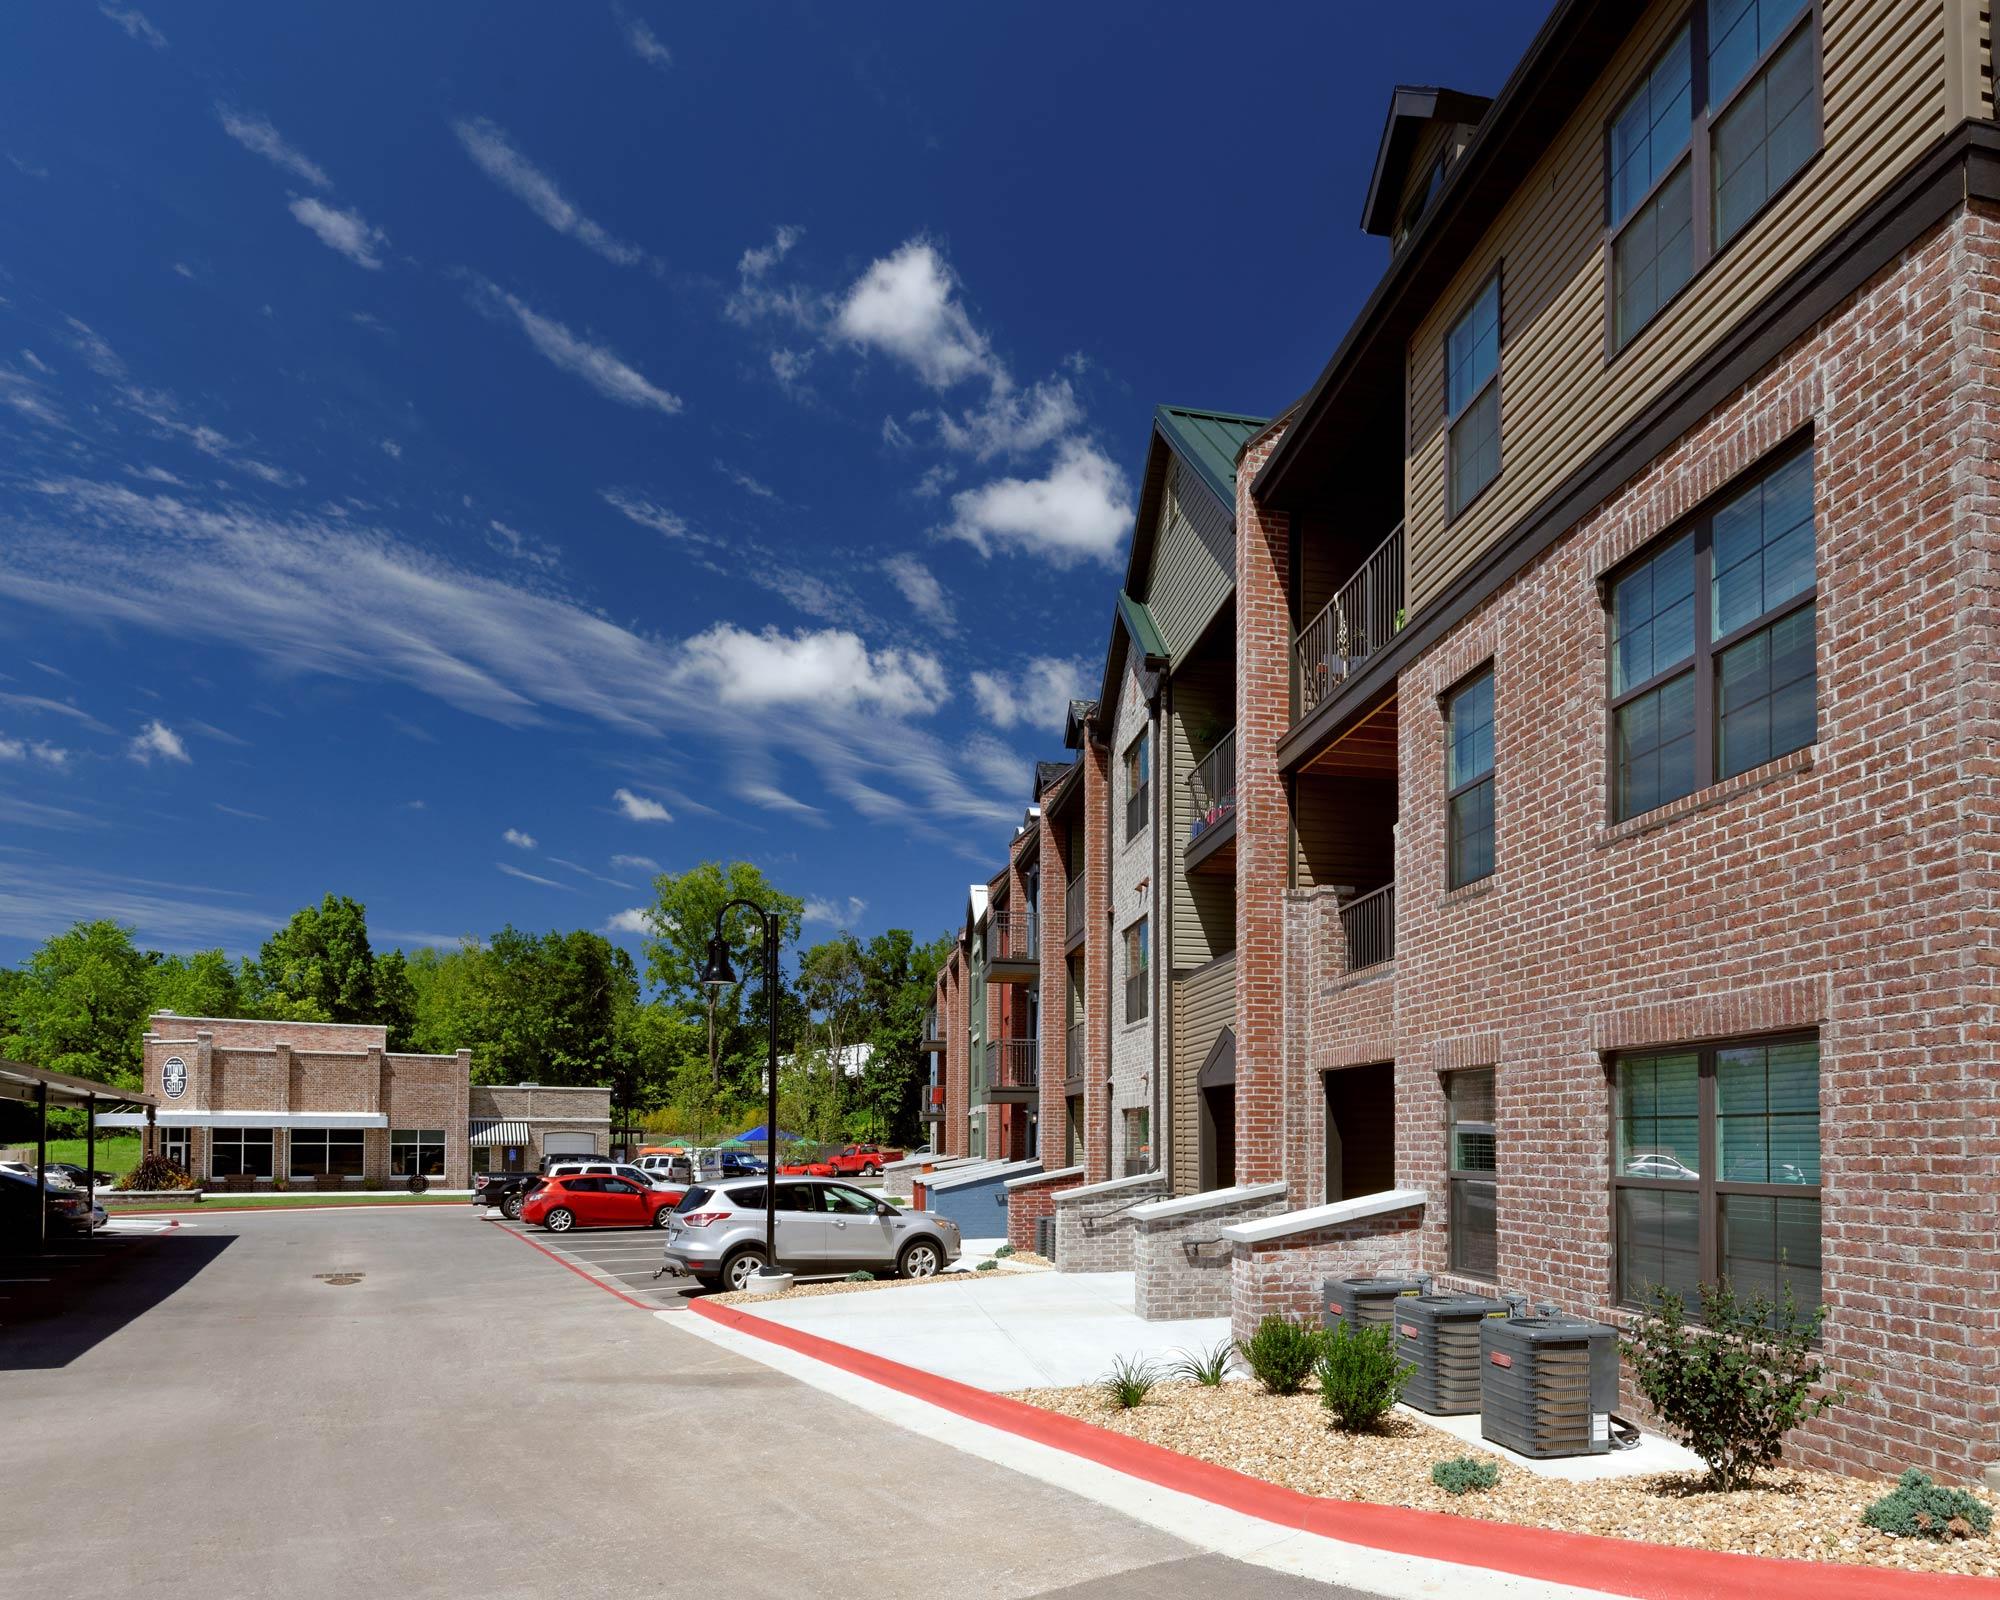 Township-28-H-Design-Exterior-03.jpg